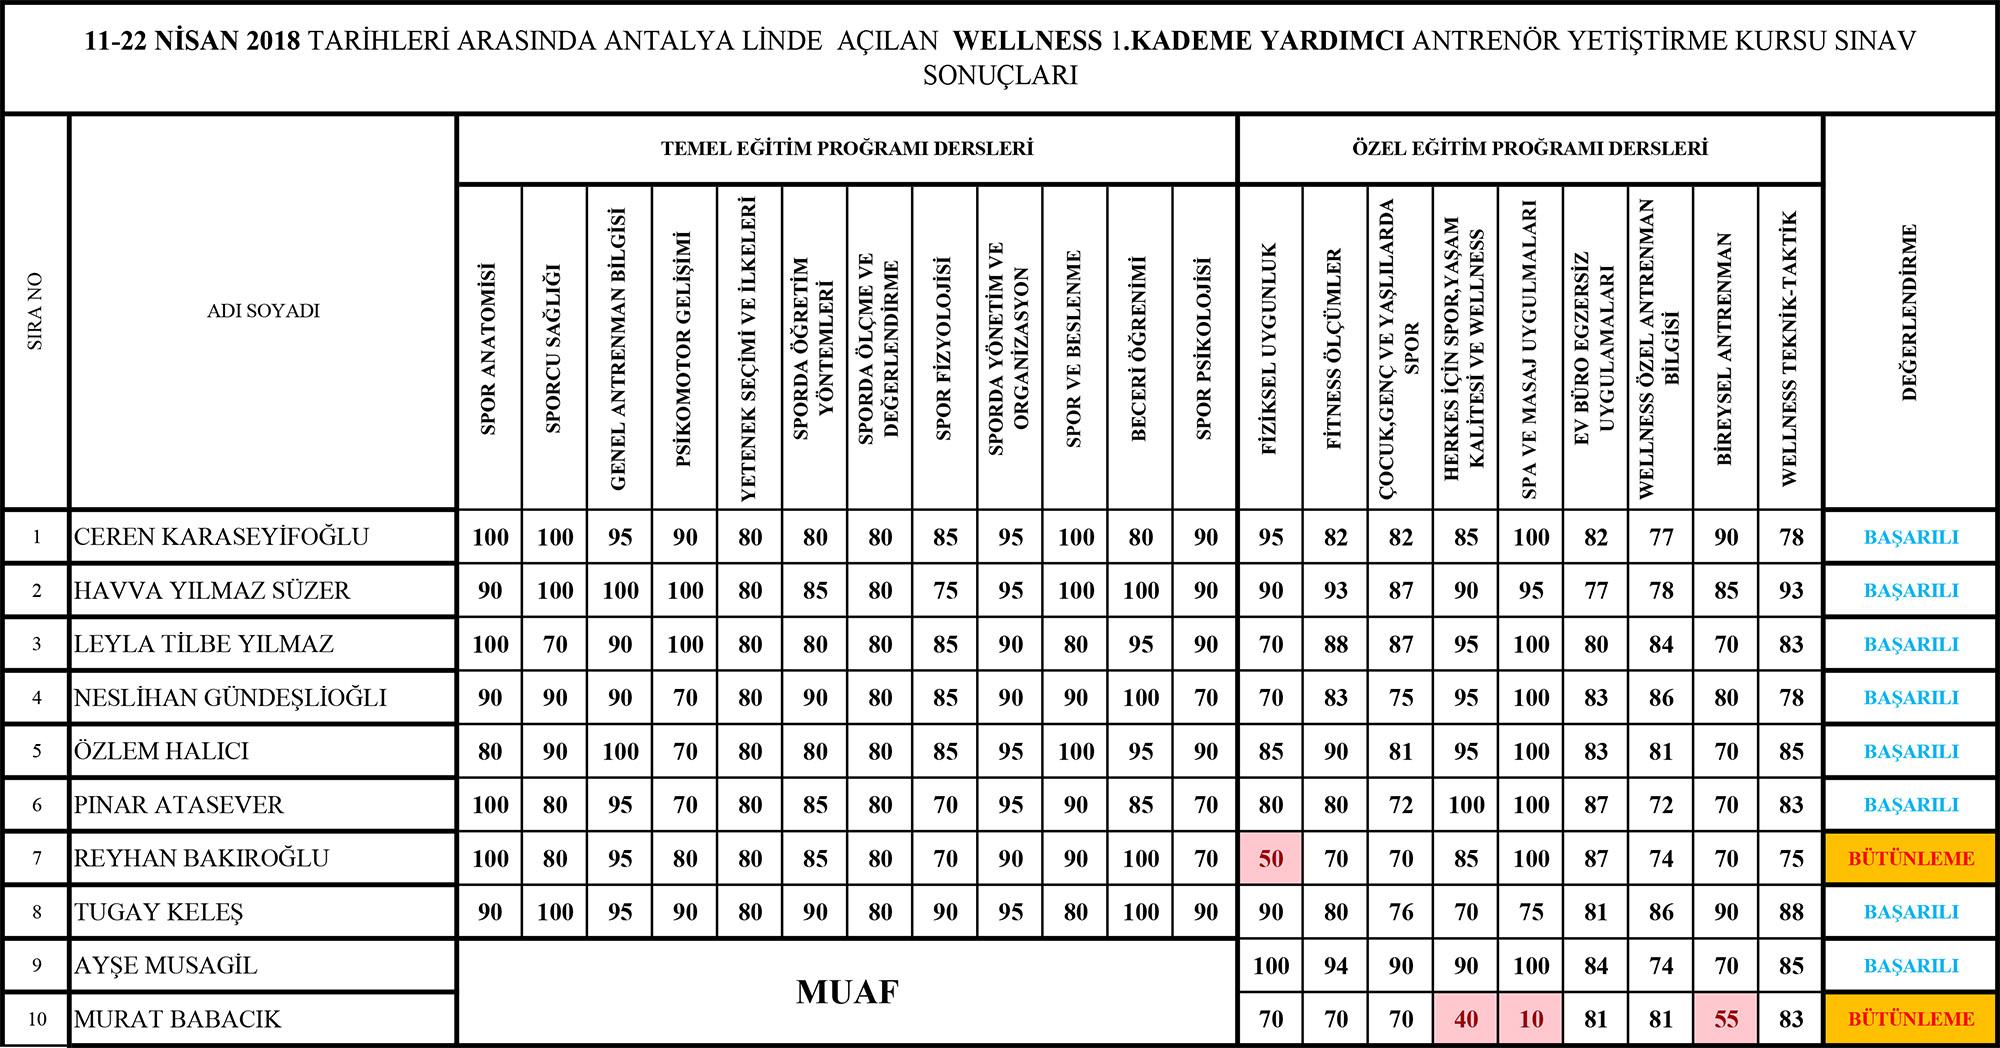 ANTALYA-11-22-NISAN-LIST